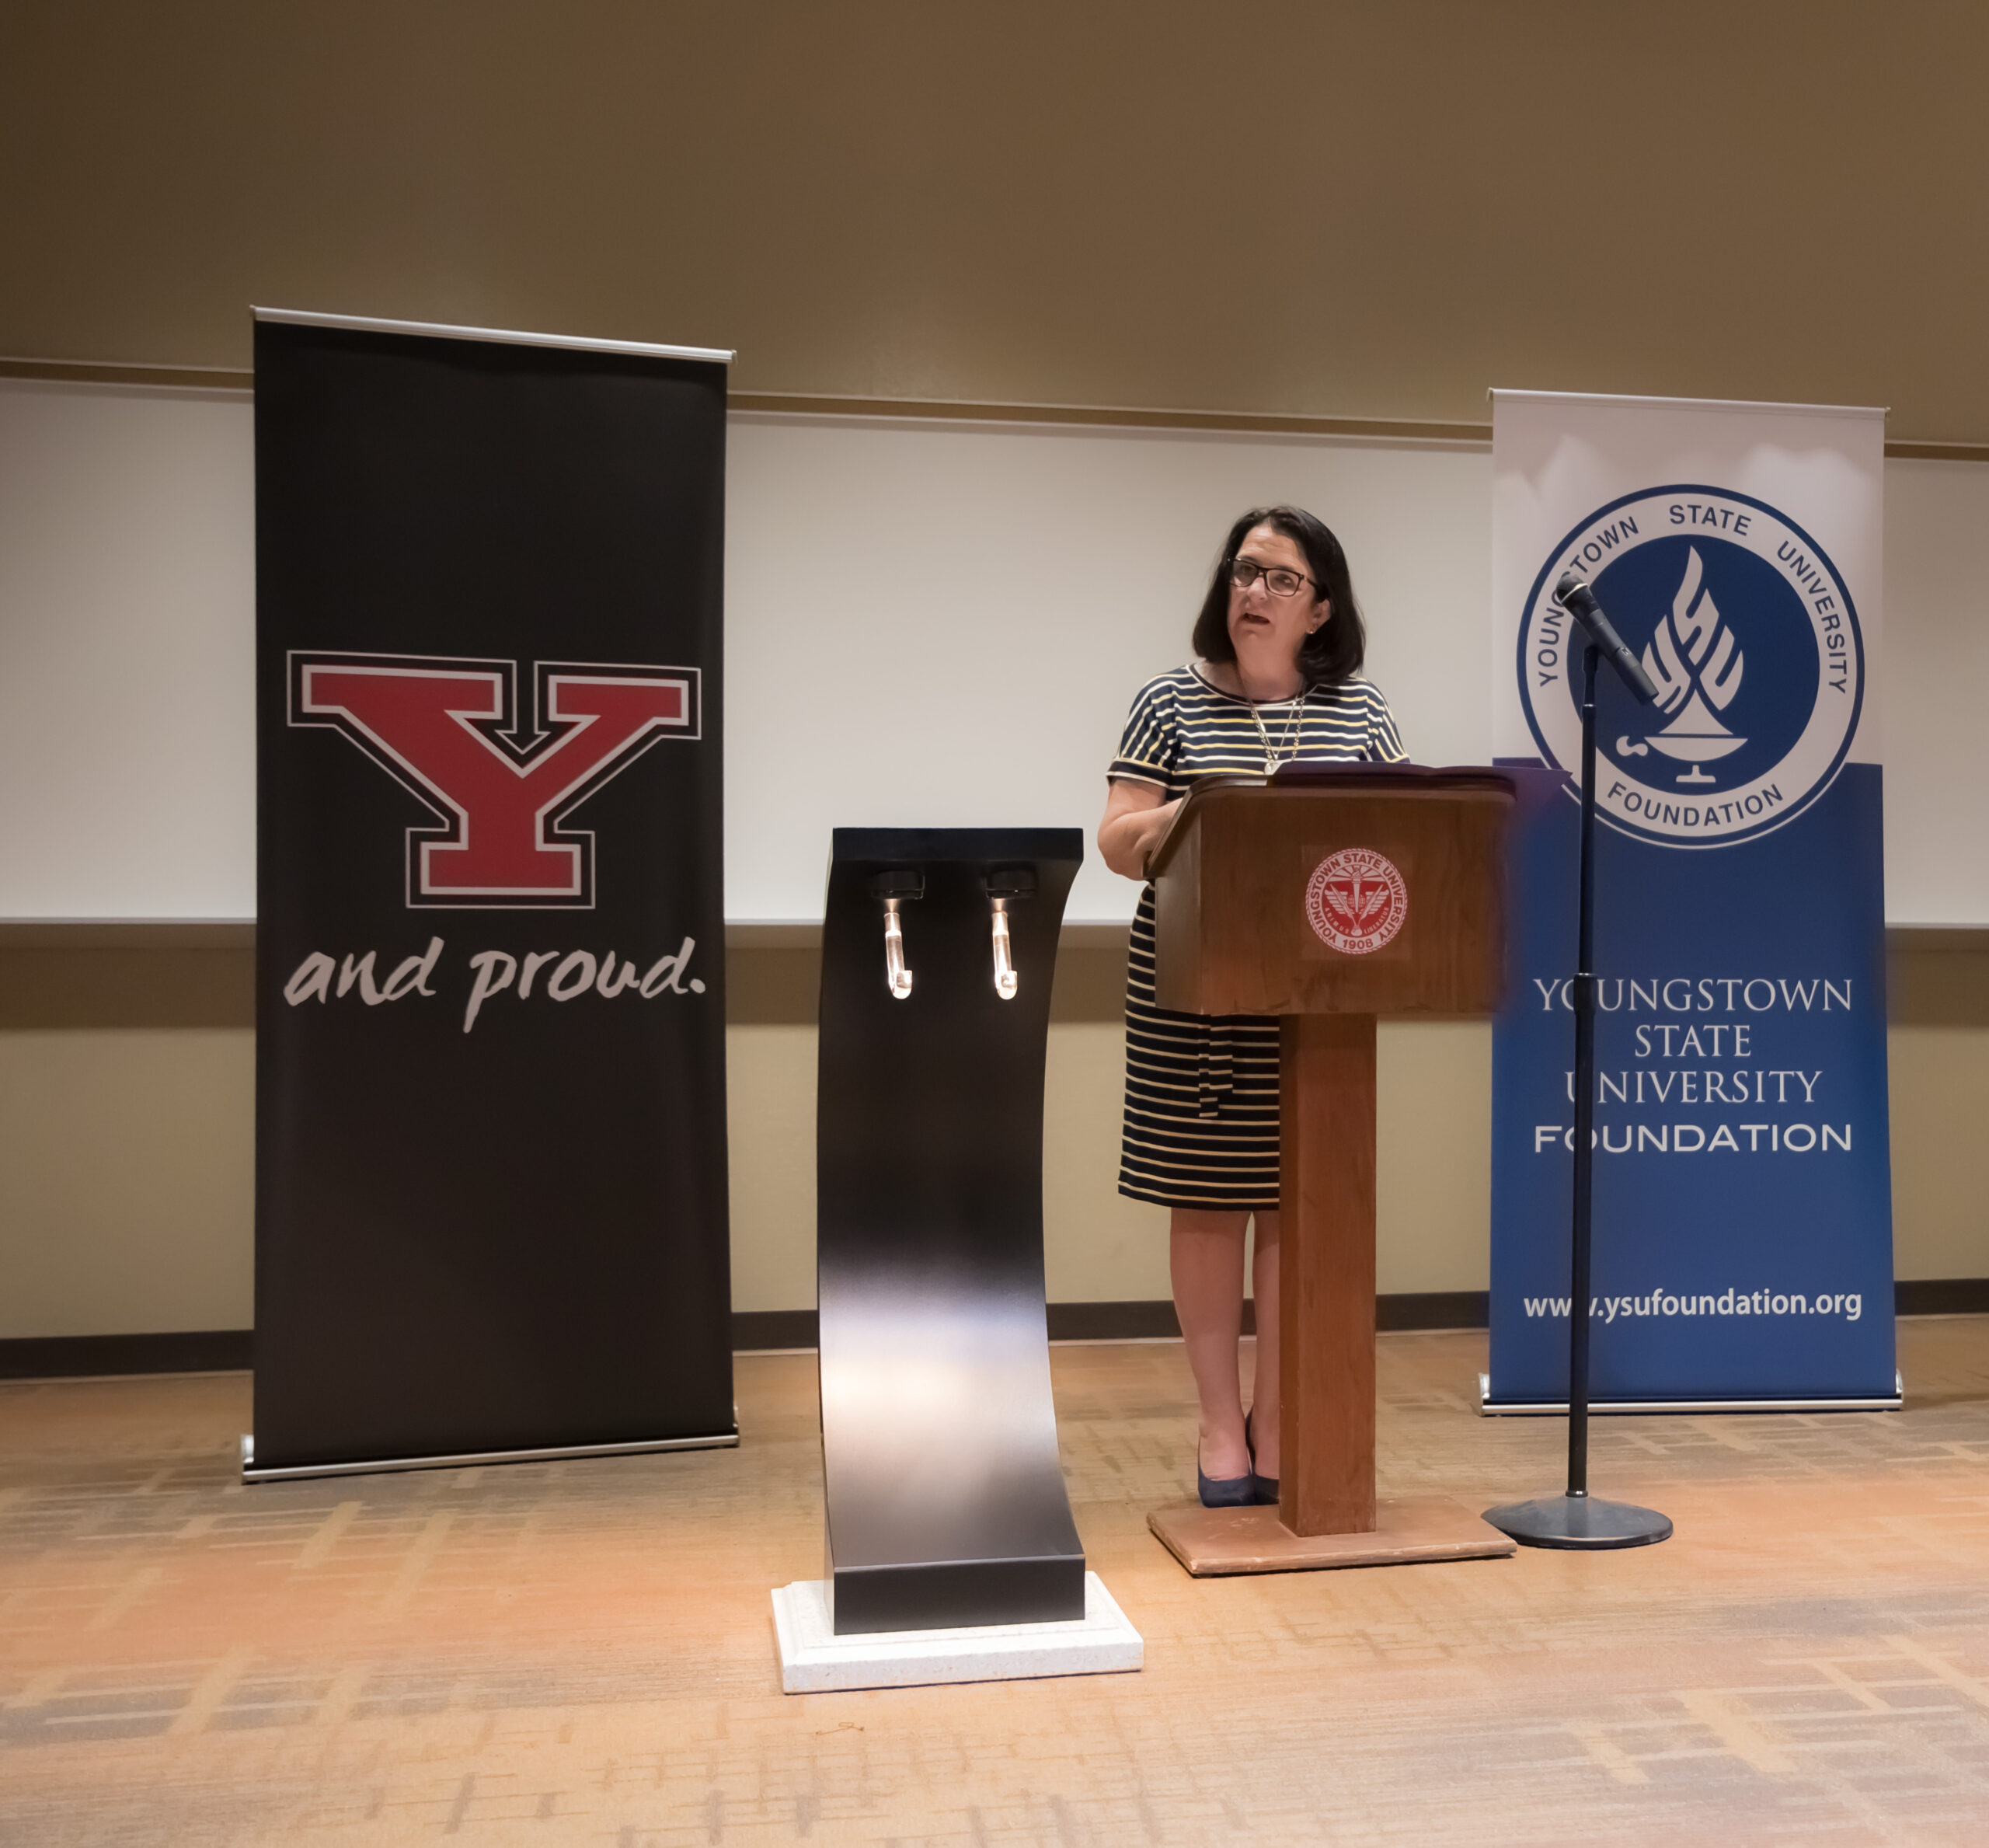 Dr. Pallante Bestowal Ceremony at YSU